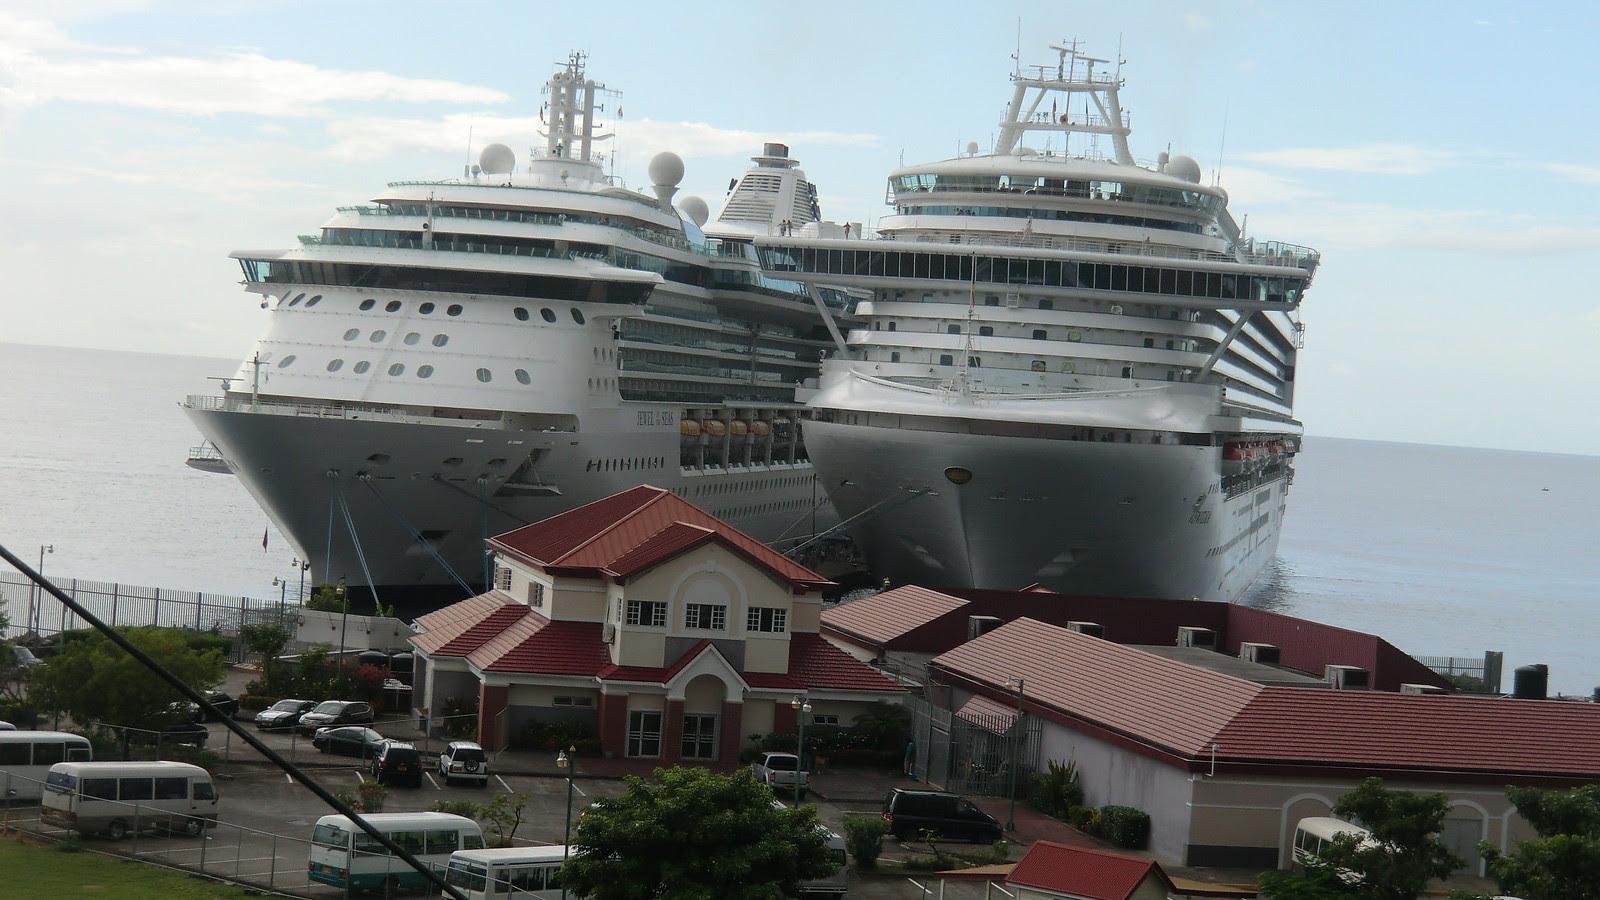 JEWEL OF THE SEAS in Grenada, Port of St. George's